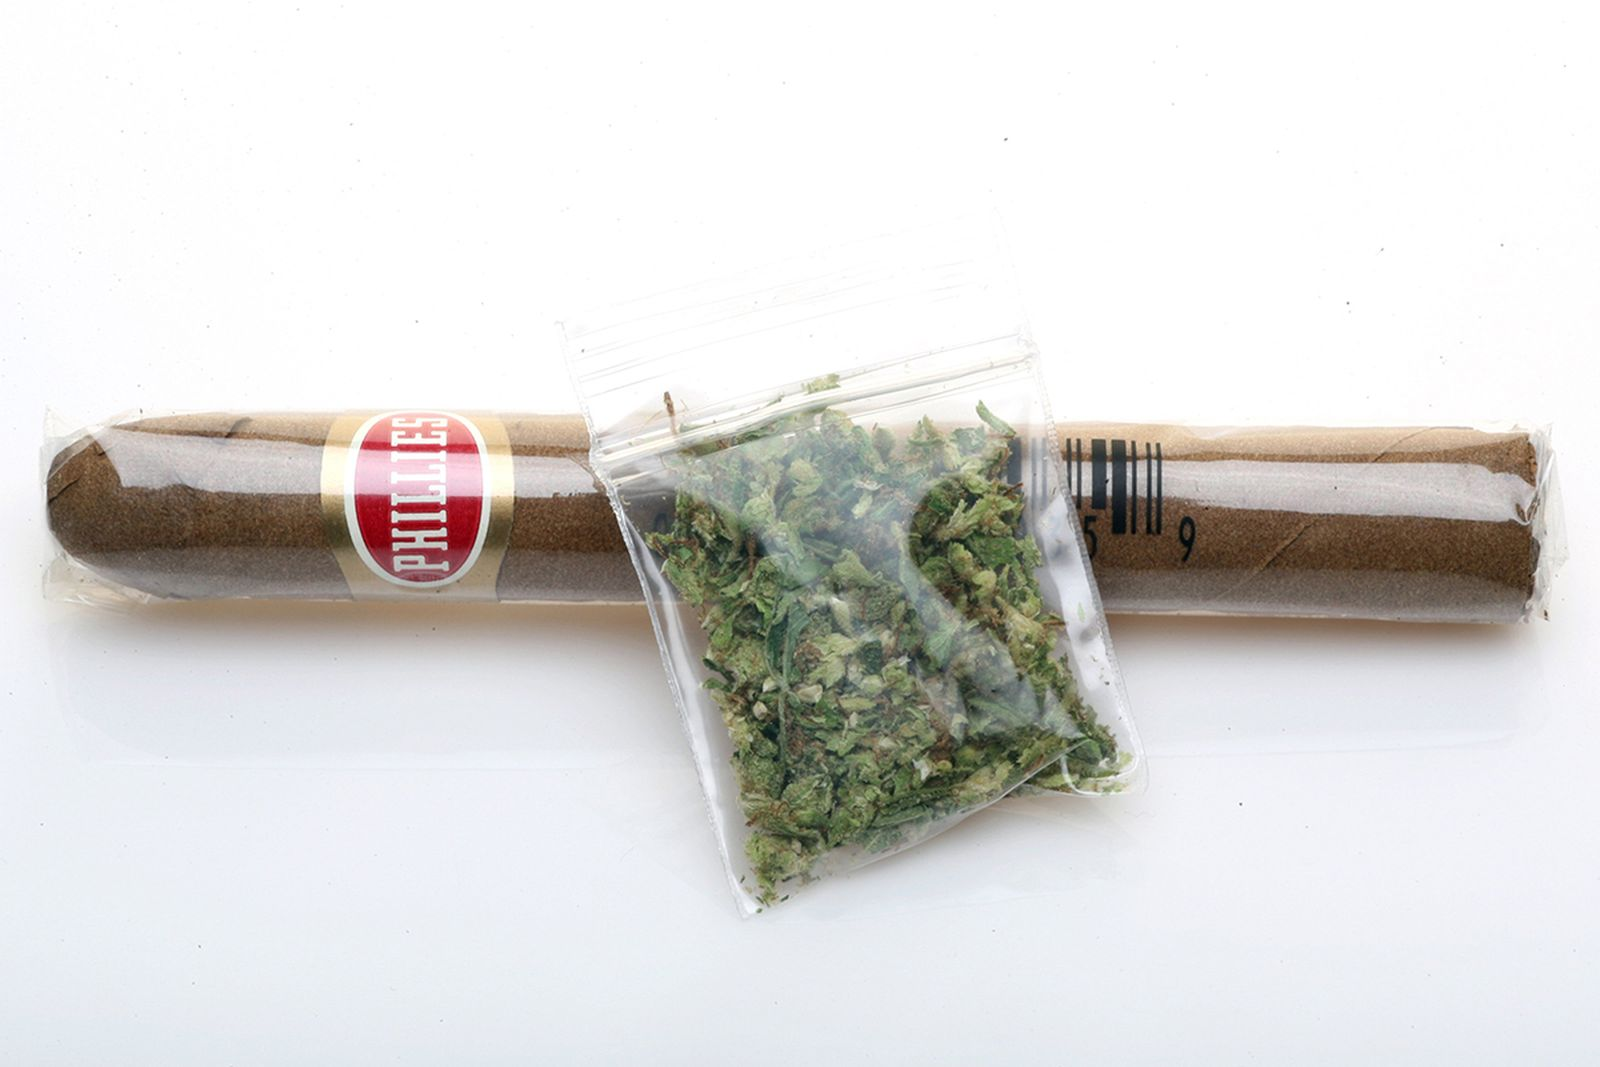 marijuana hip hop culture 420 N.W.A. beastie boys